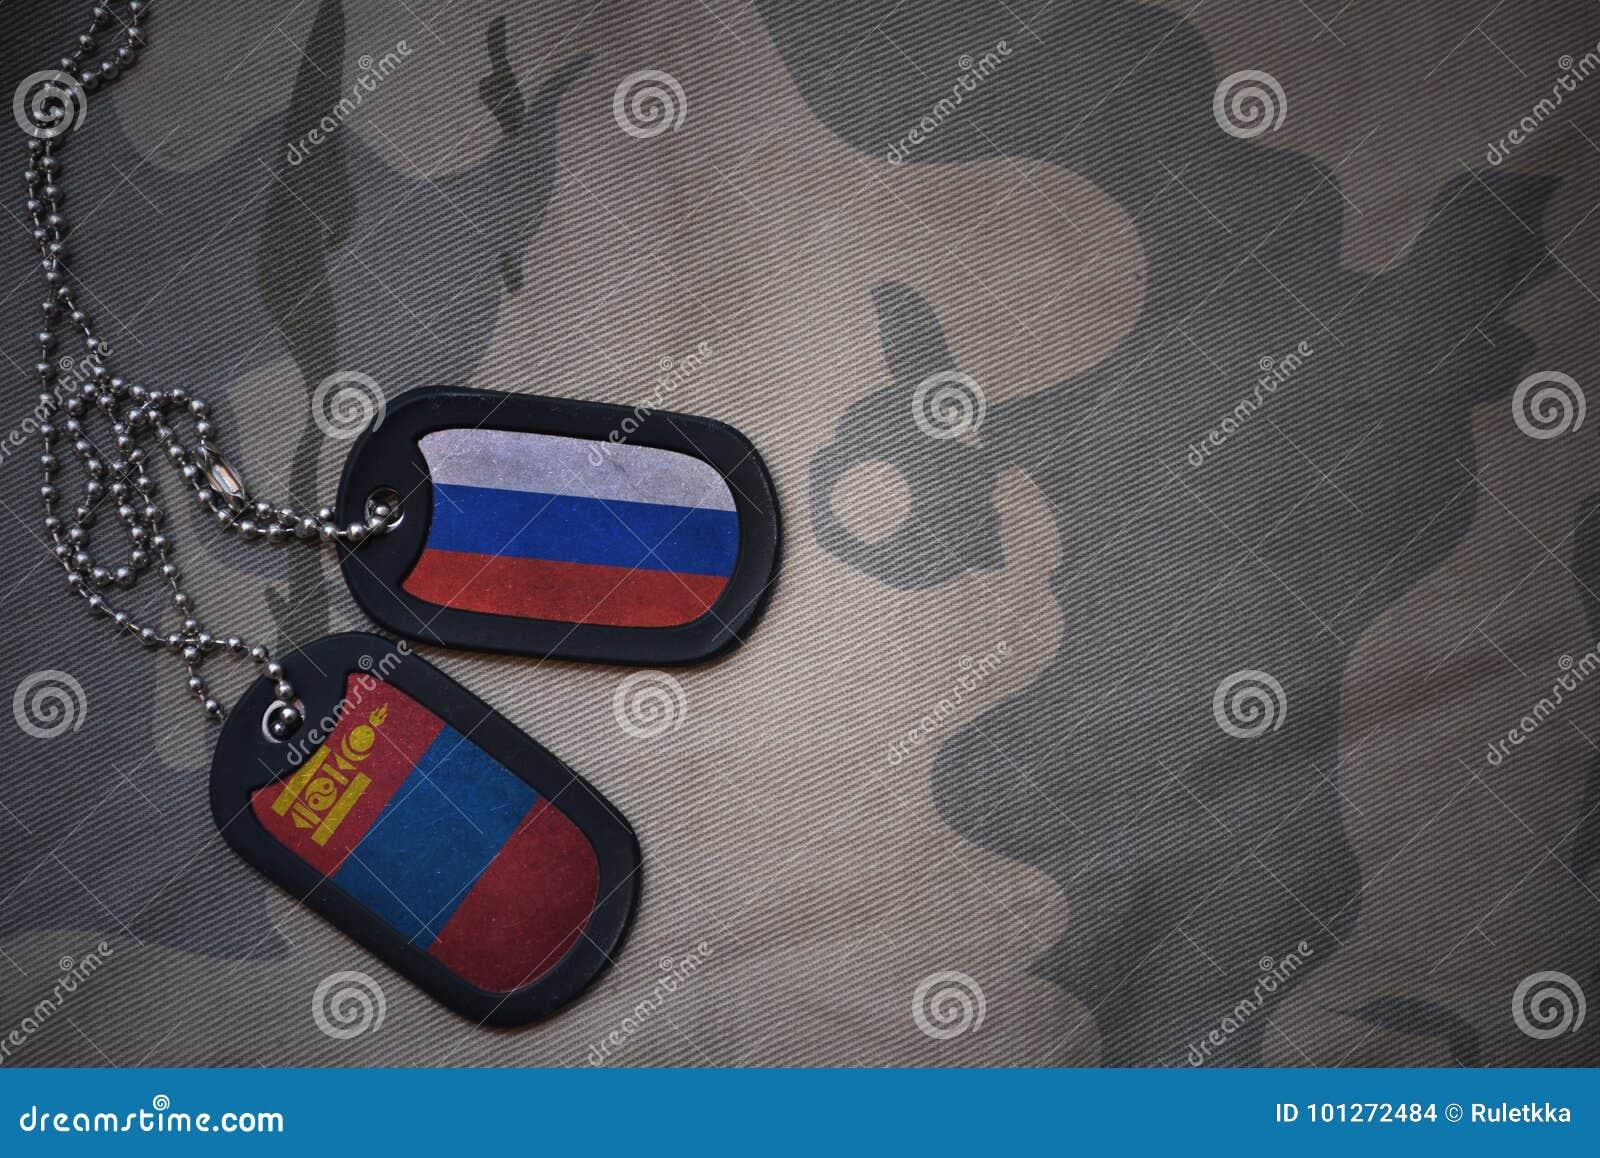 Wojska puste miejsce, psia etykietka z flaga Russia i Mongolia na khakim tekstury tle,